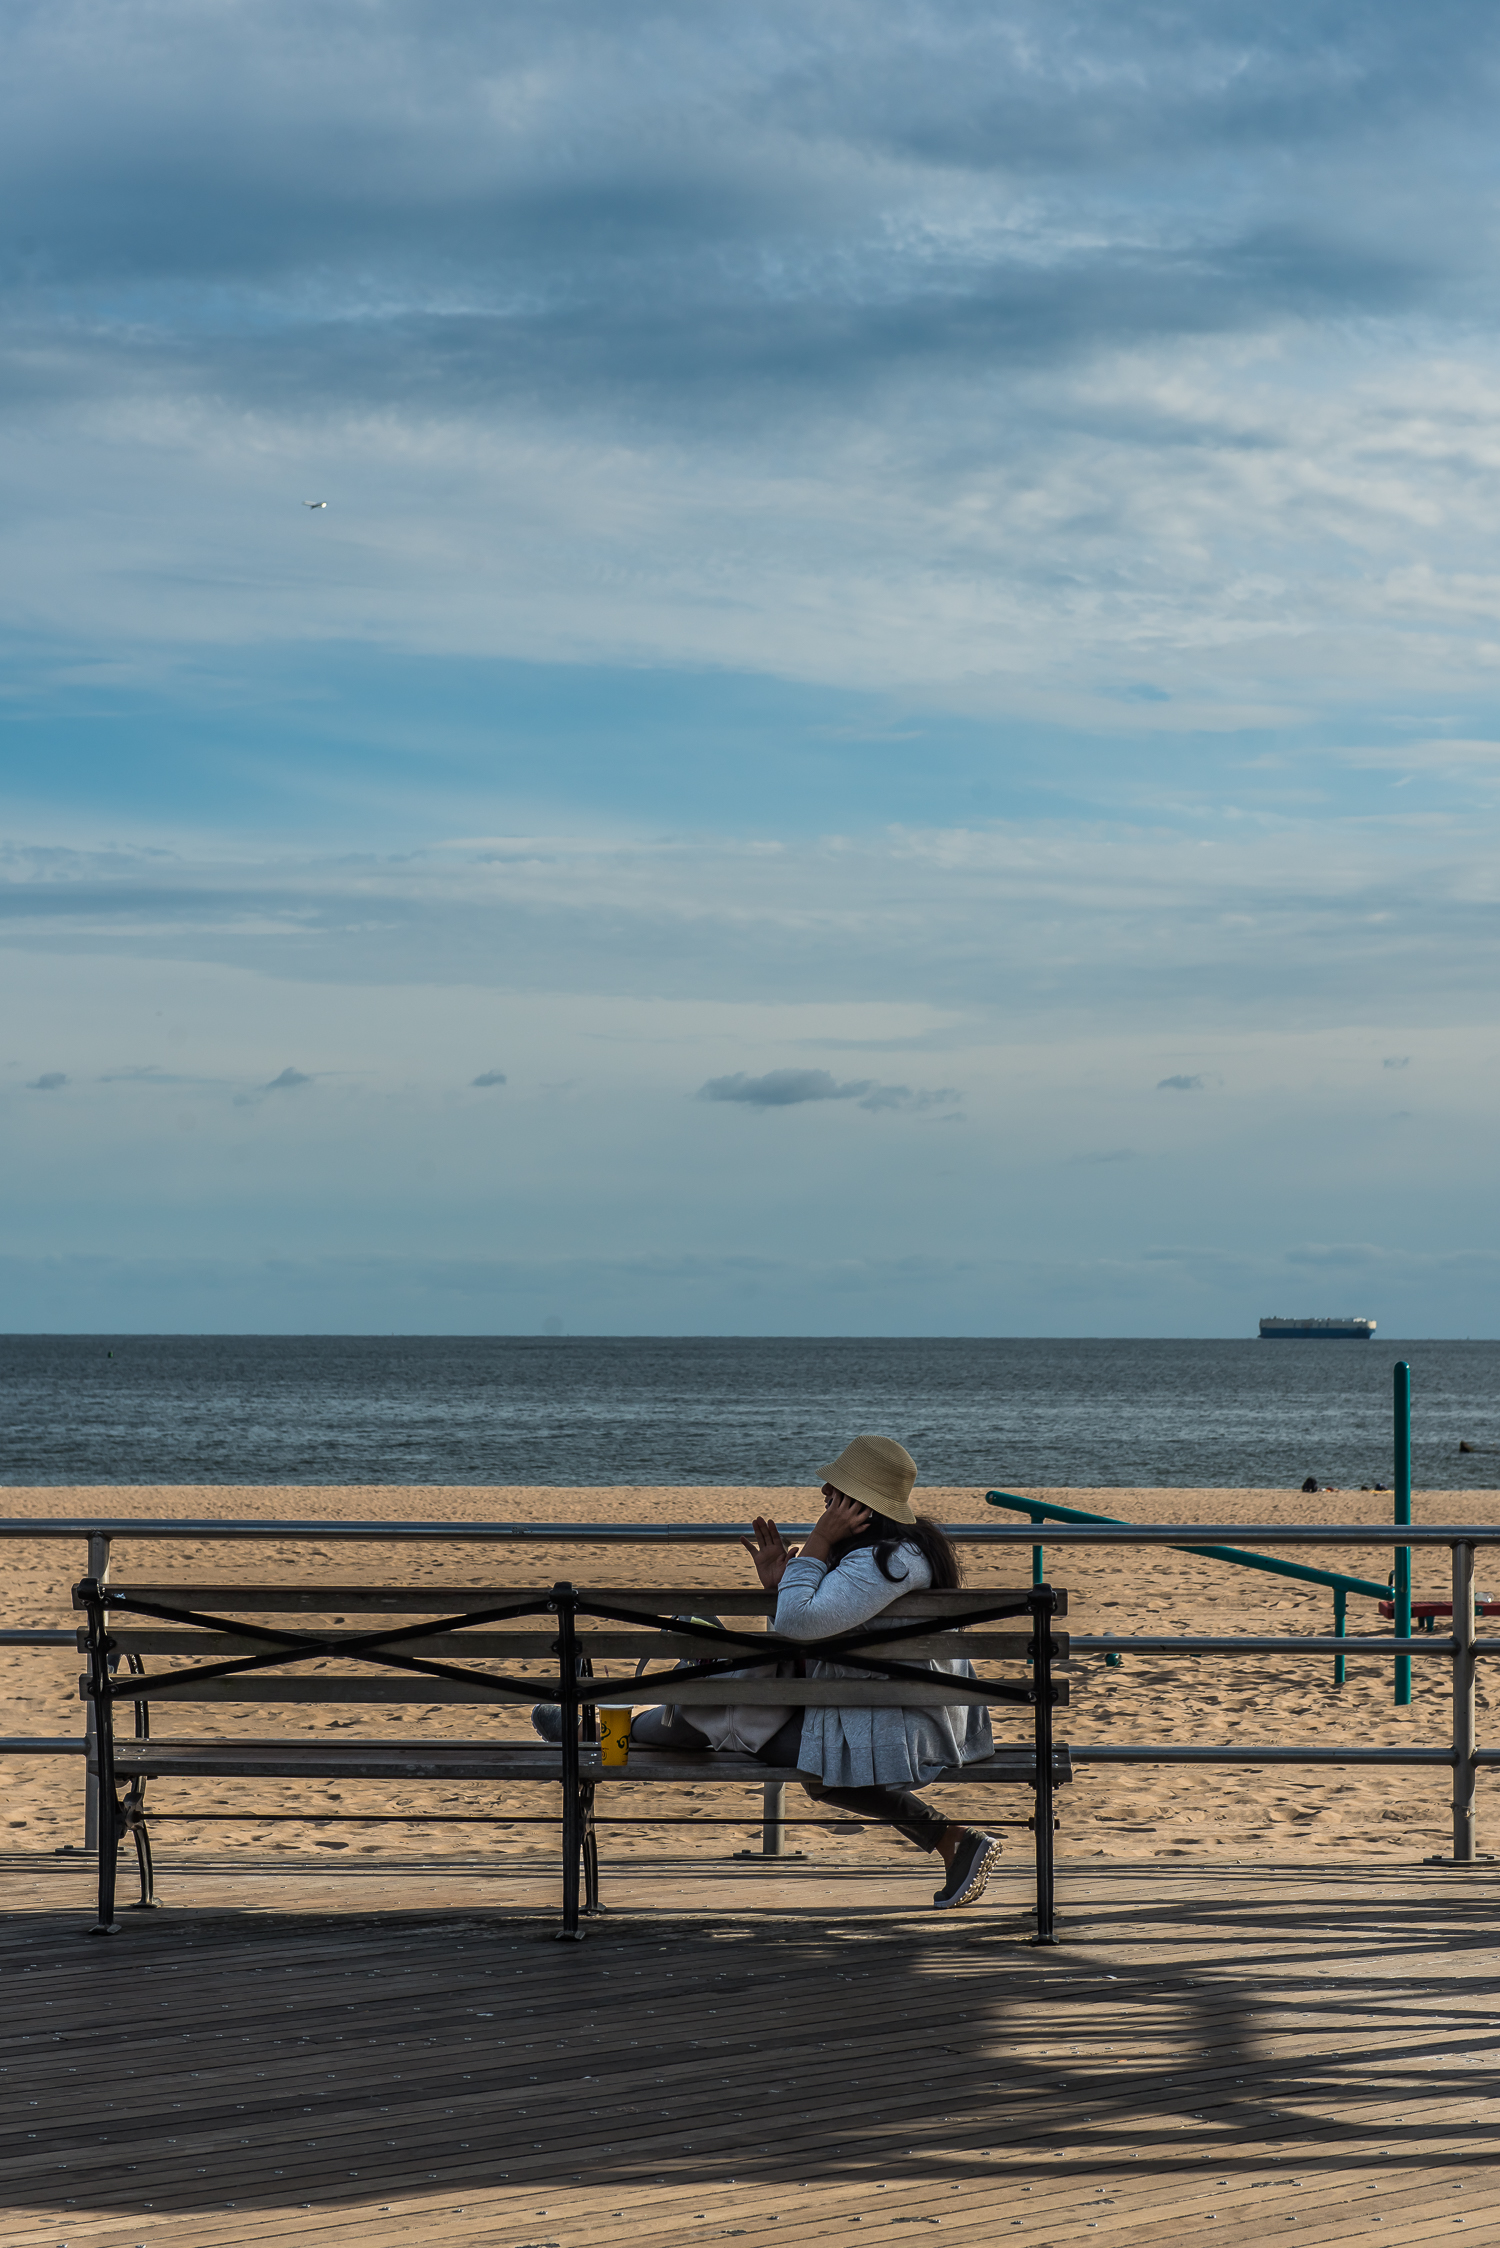 Coney Island - The call